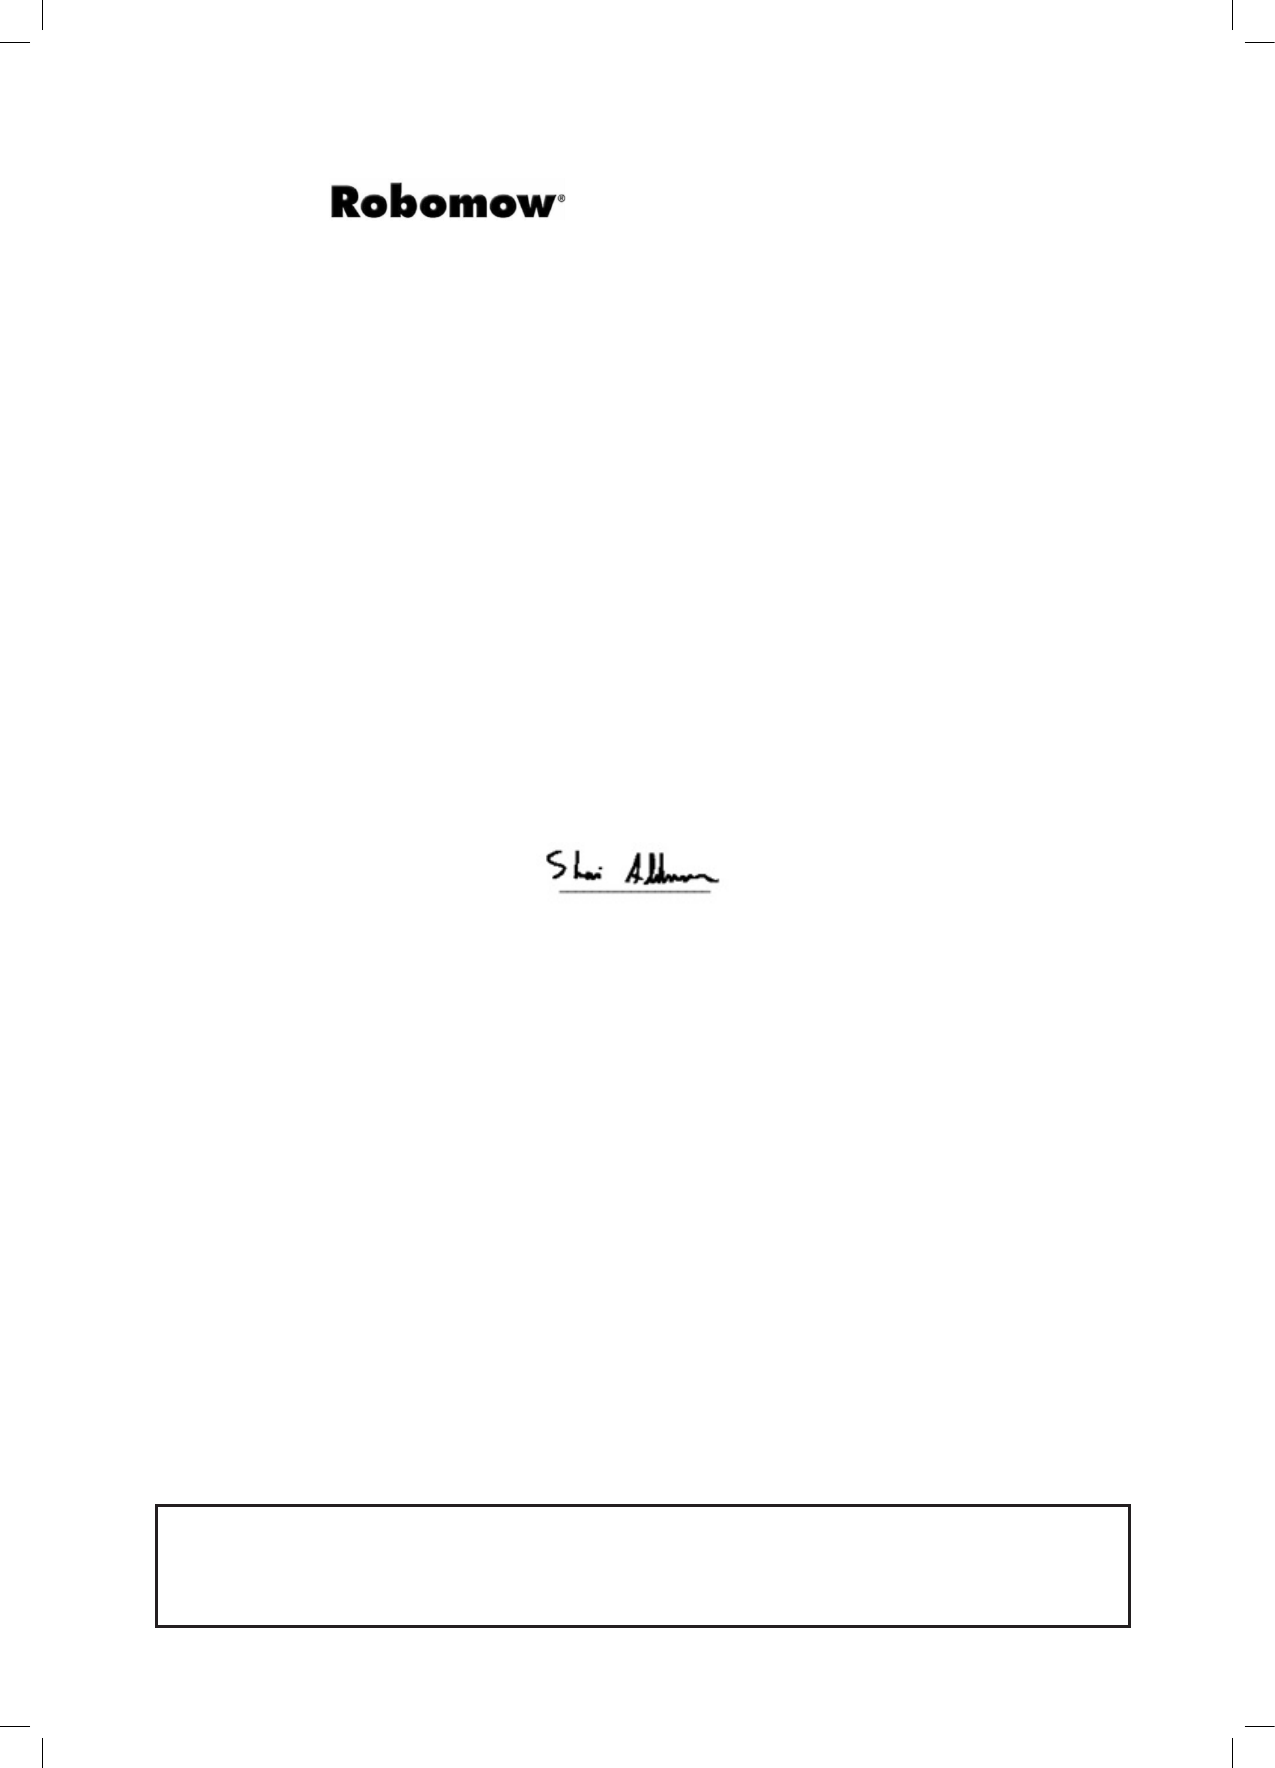 Handleiding Robomow Mc150 Pagina 2 Van 50 English 50tc Wiring Diagram 3